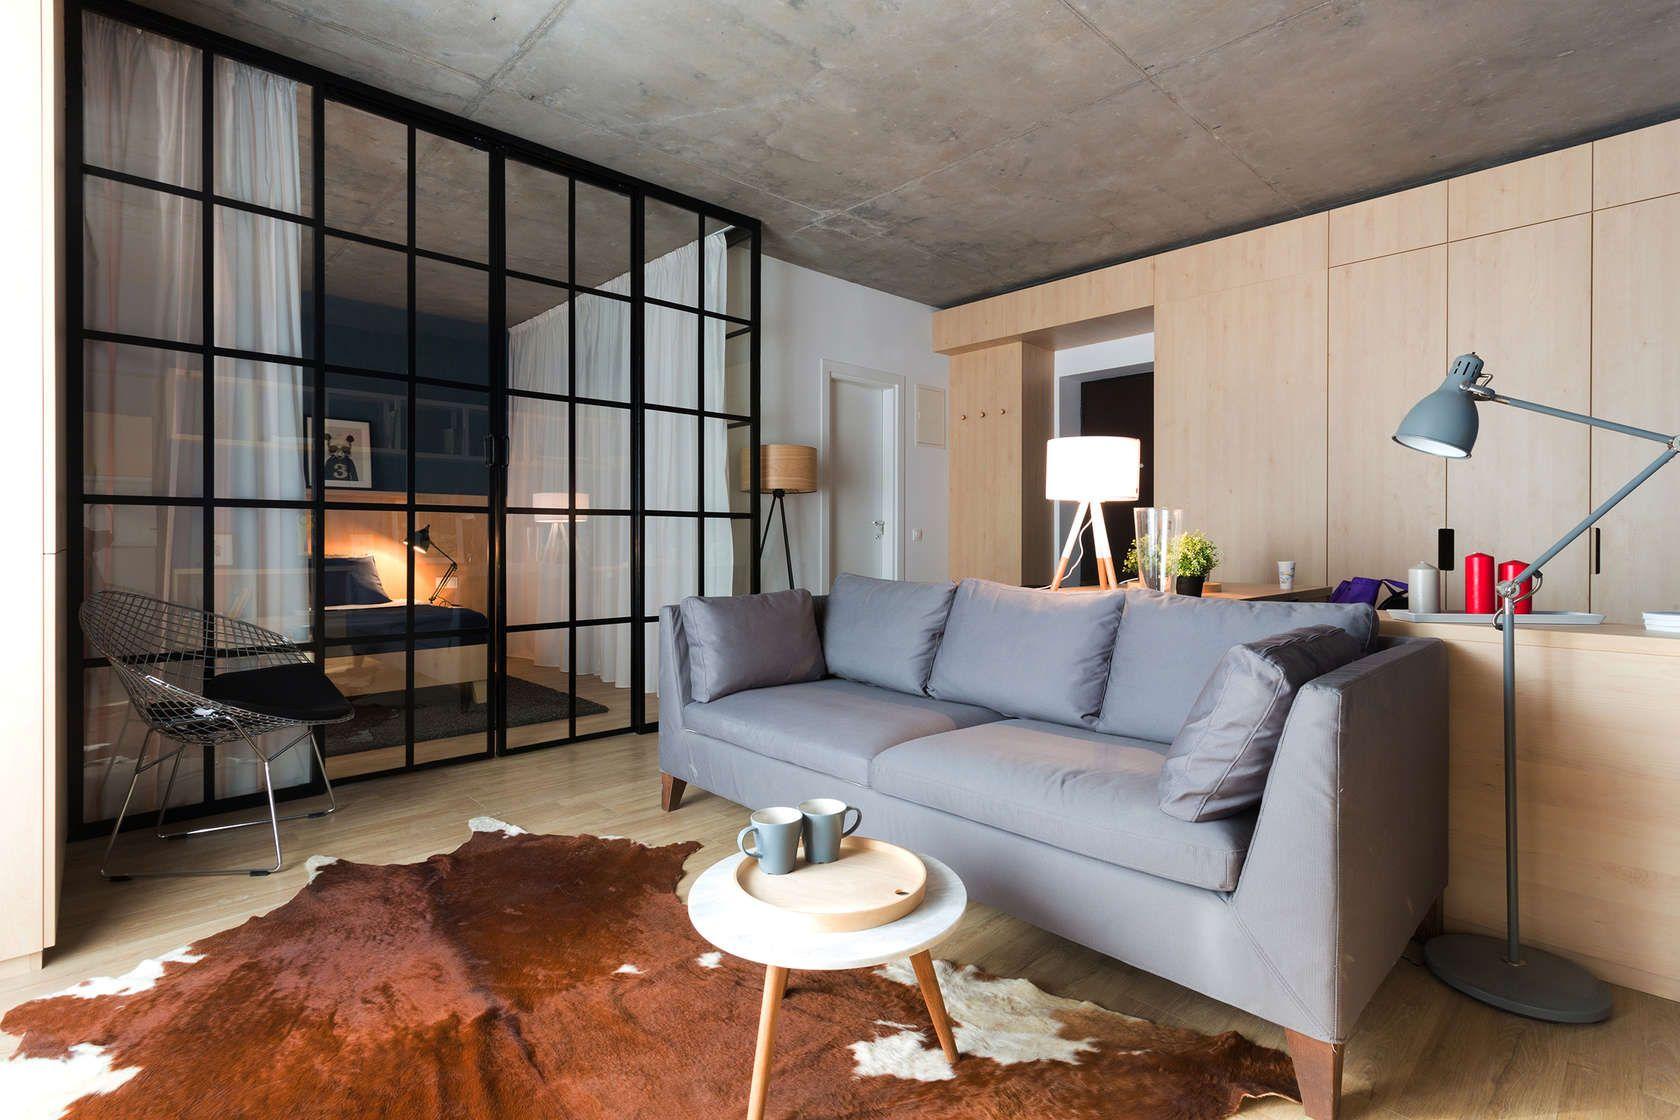 3 bedroom loft  architizerprojectsapartmentno  sqm  Pinterest